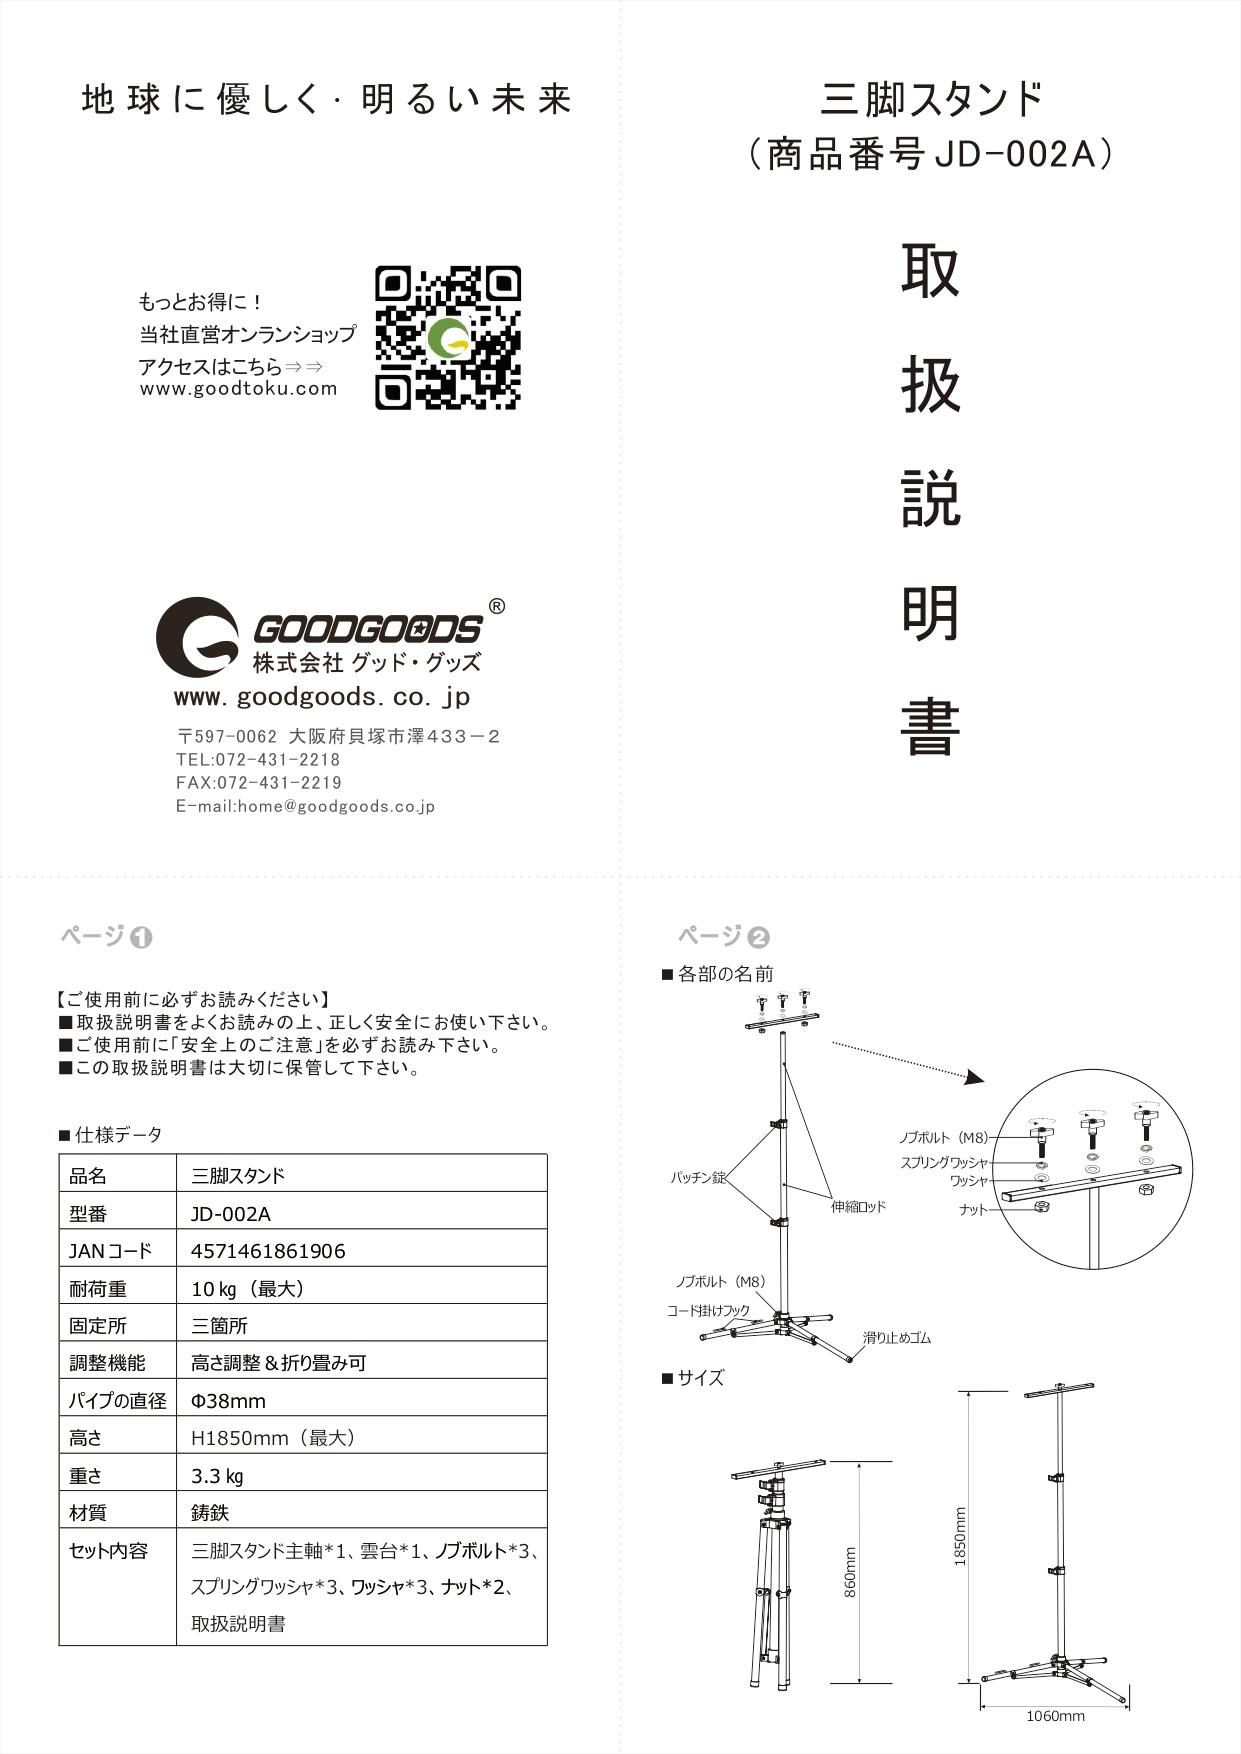 jd-002a-11.jpg